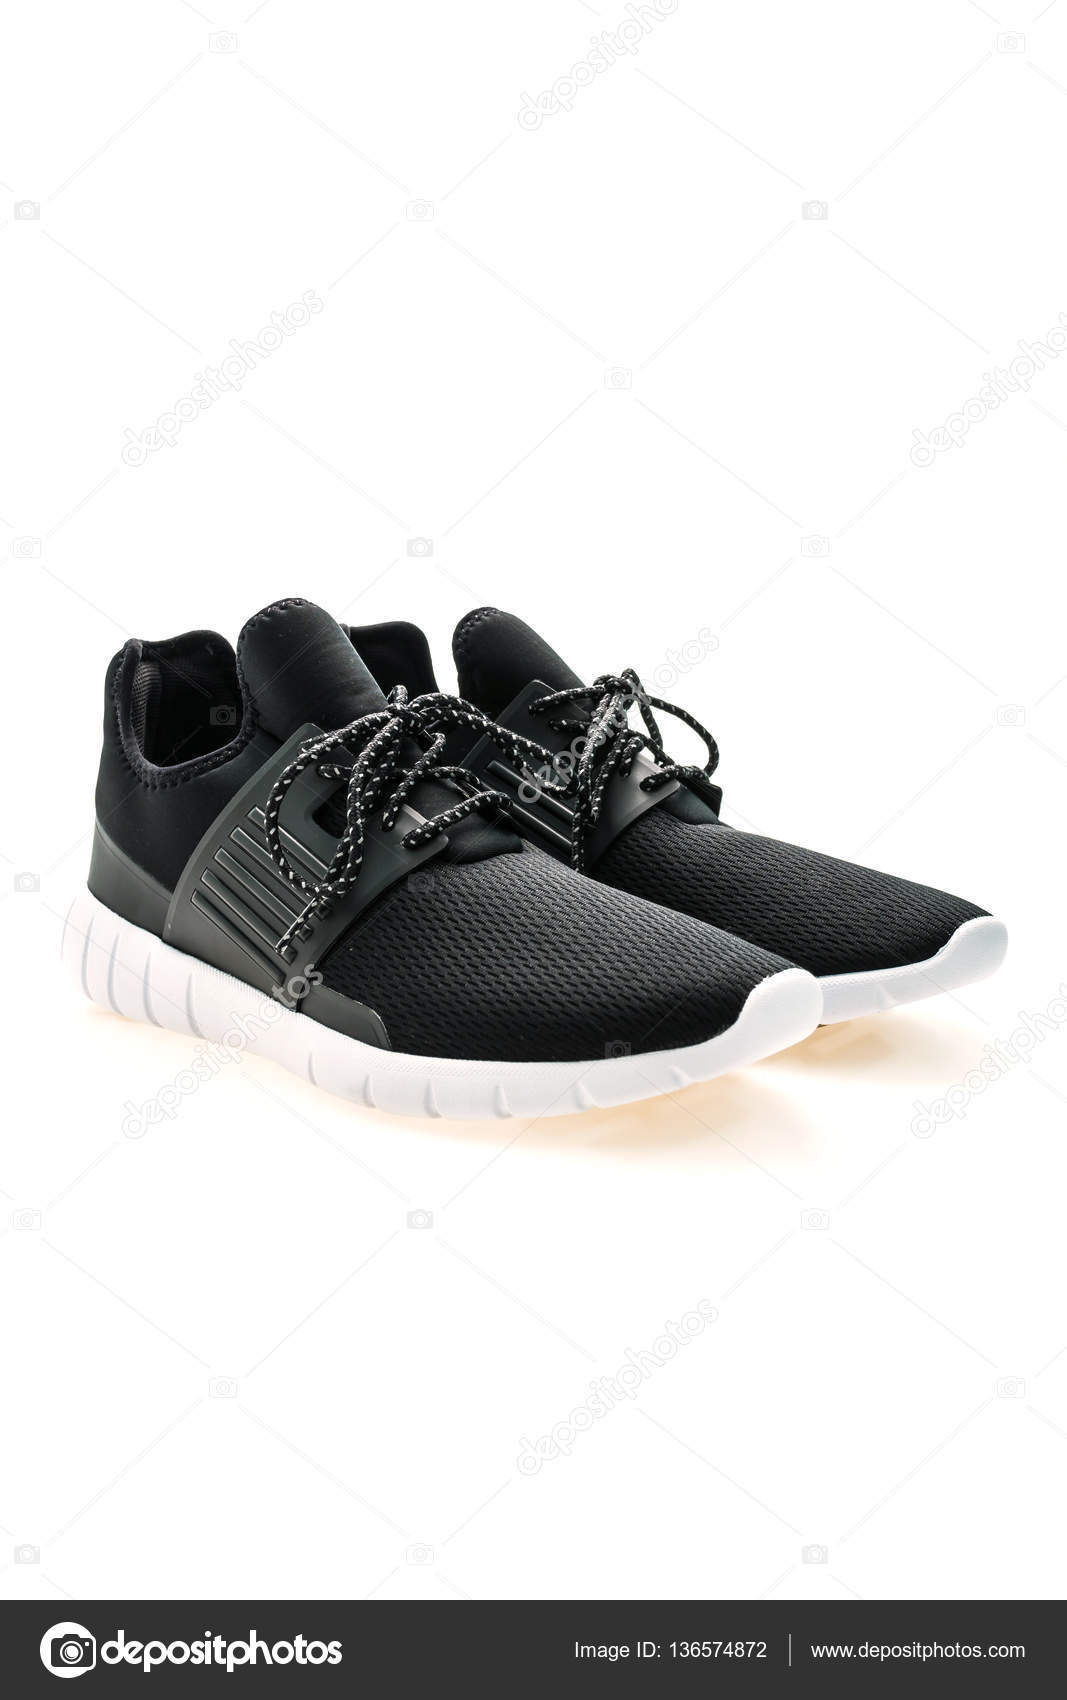 1a1586c9c0d Αθλητικά παπούτσια για τρέξιμο — Φωτογραφία Αρχείου © mrsiraphol ...